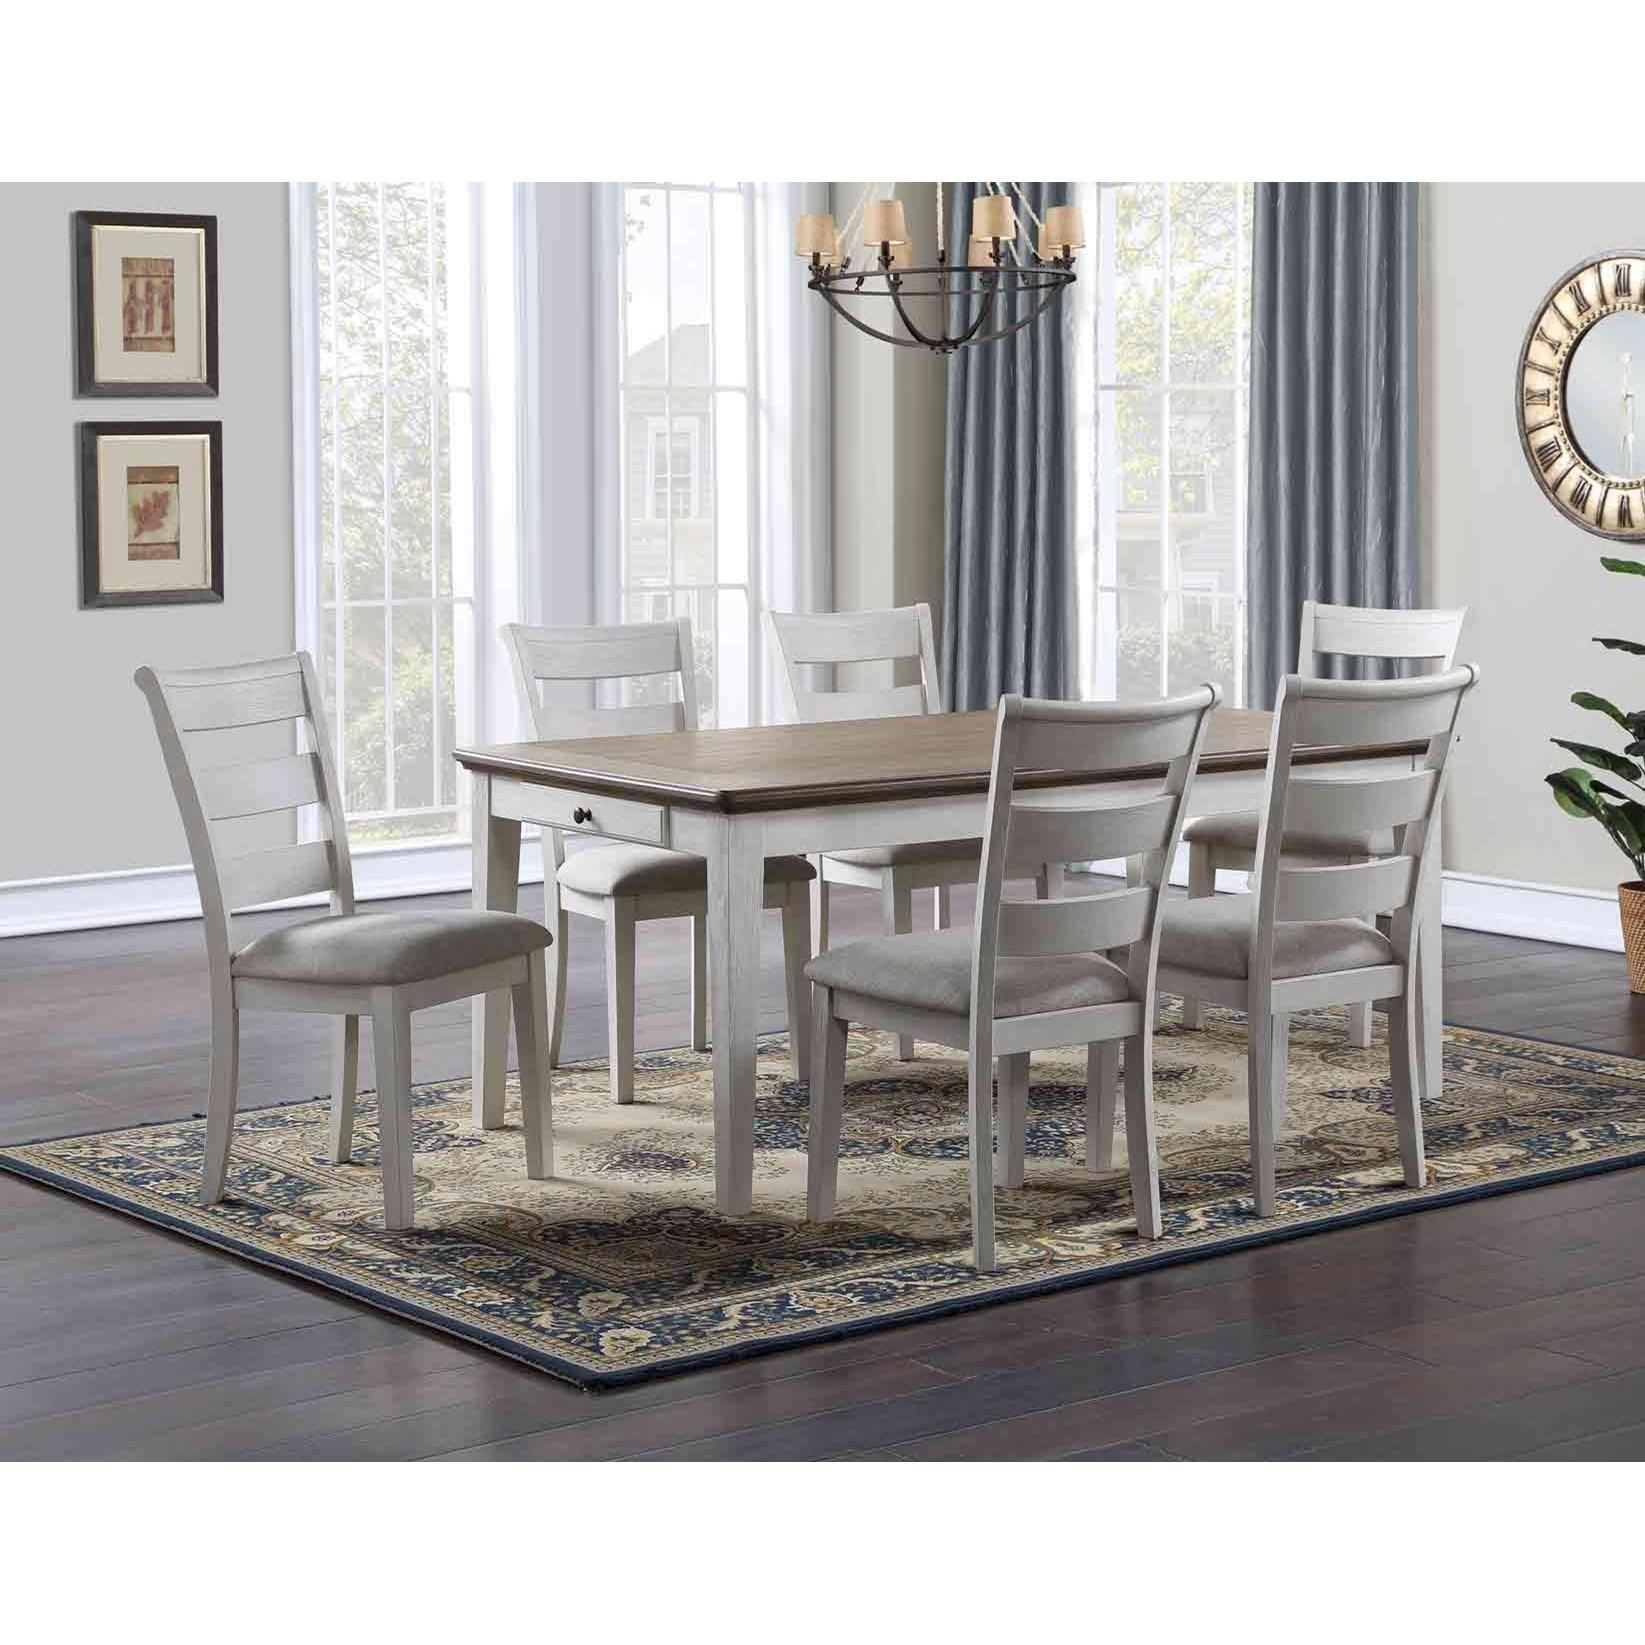 Pendleton 7-Piece Dining Set  by Steve Silver at Walker's Furniture